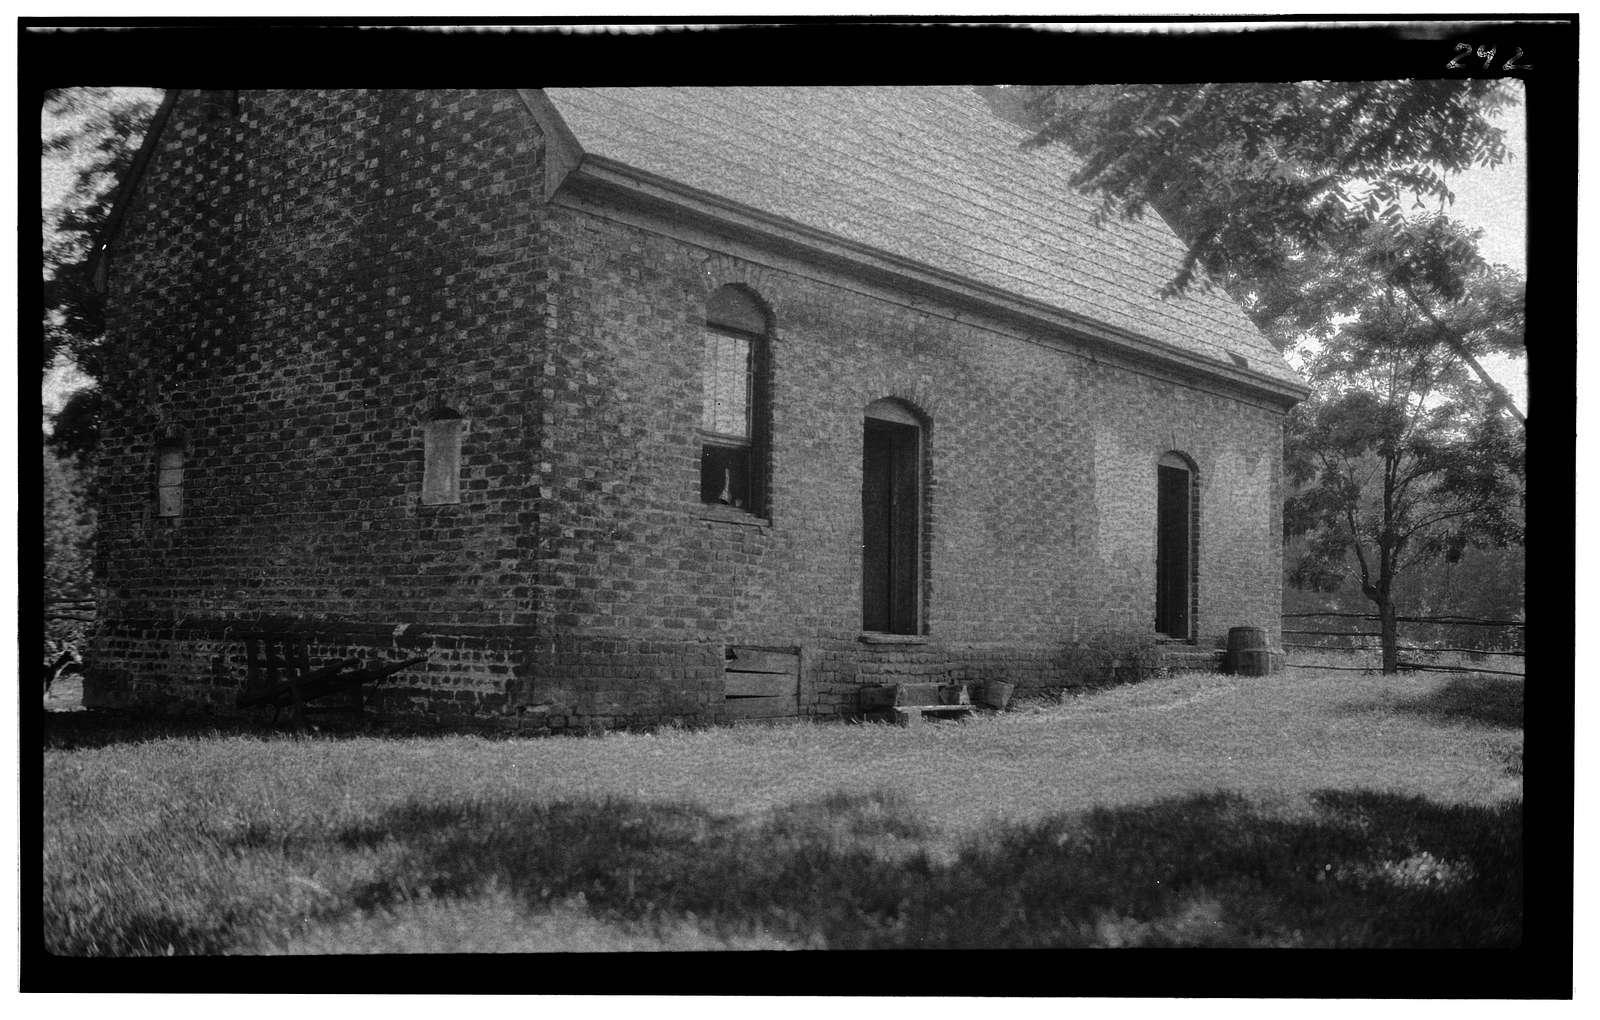 Warburton House, Pinewoods Pond vicinity, Lightfoot, James City County, VA